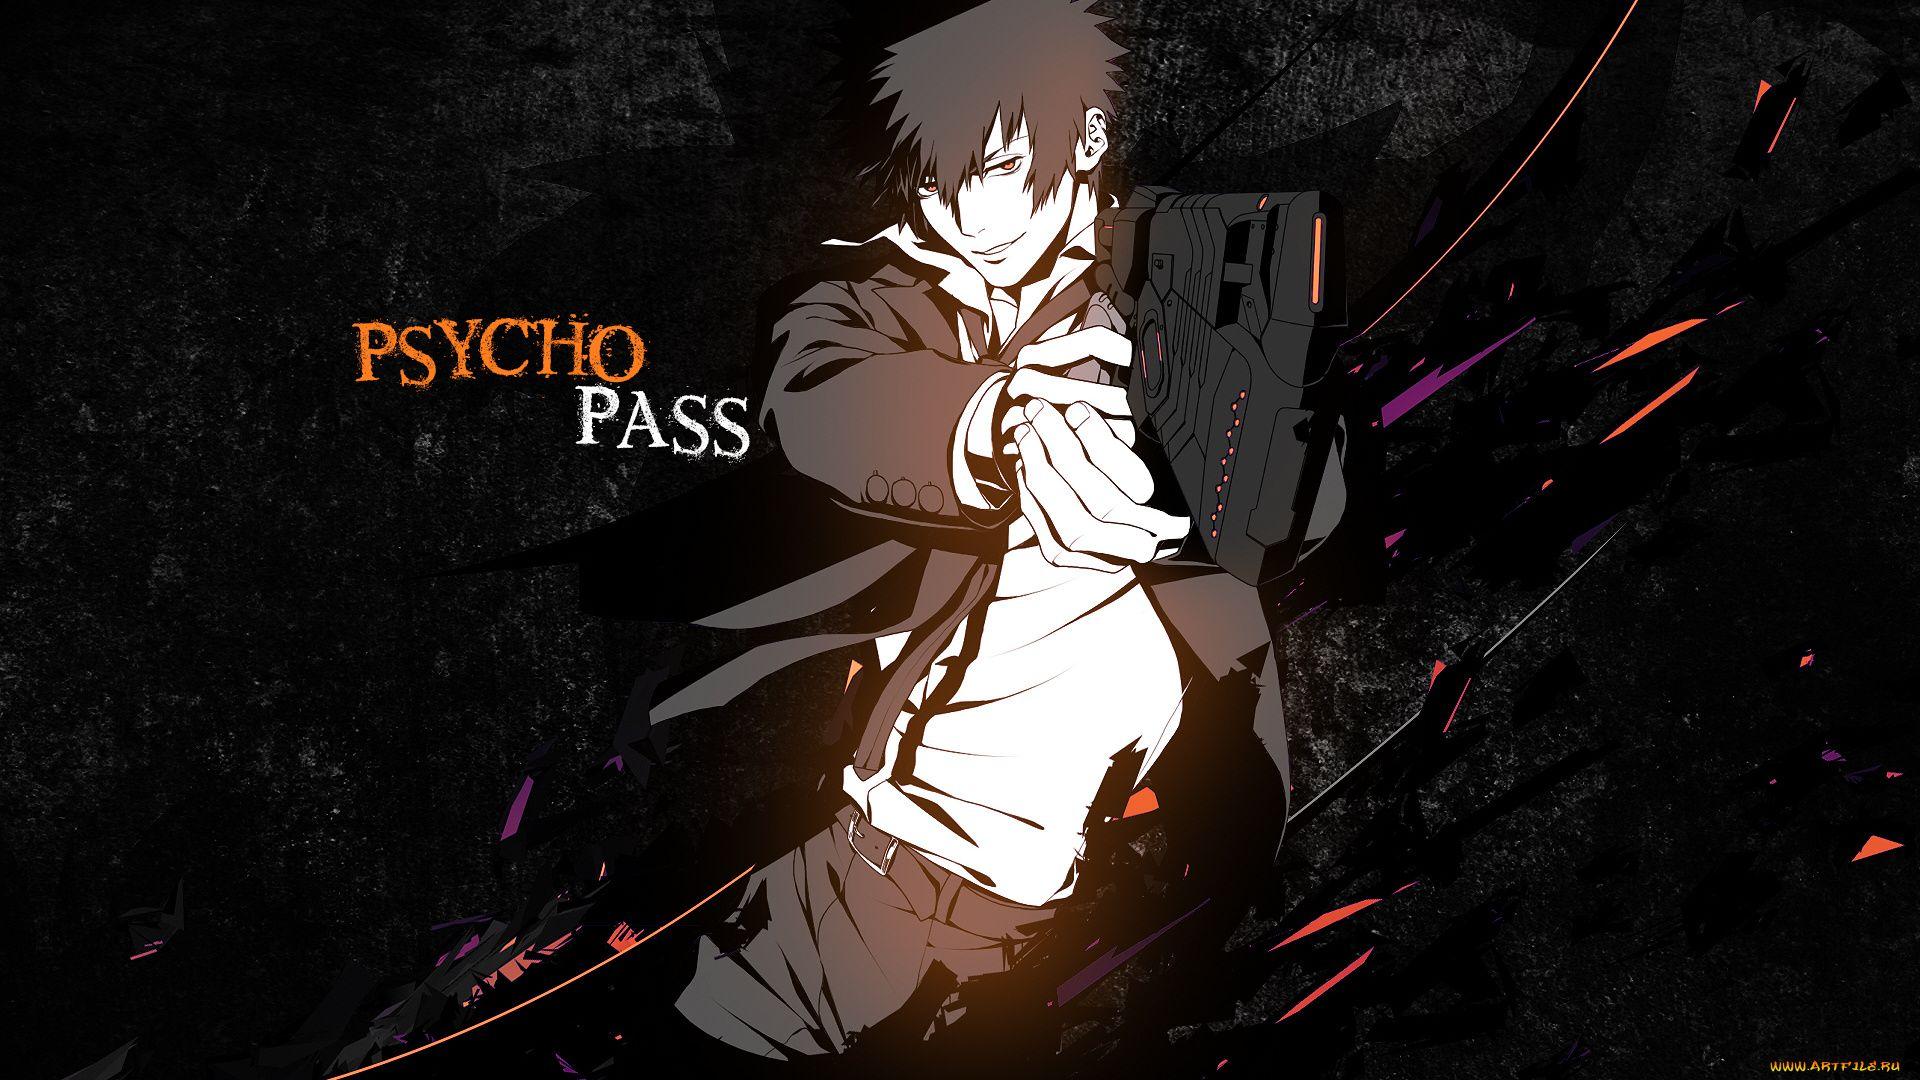 Psycho Pass download wallpaper image